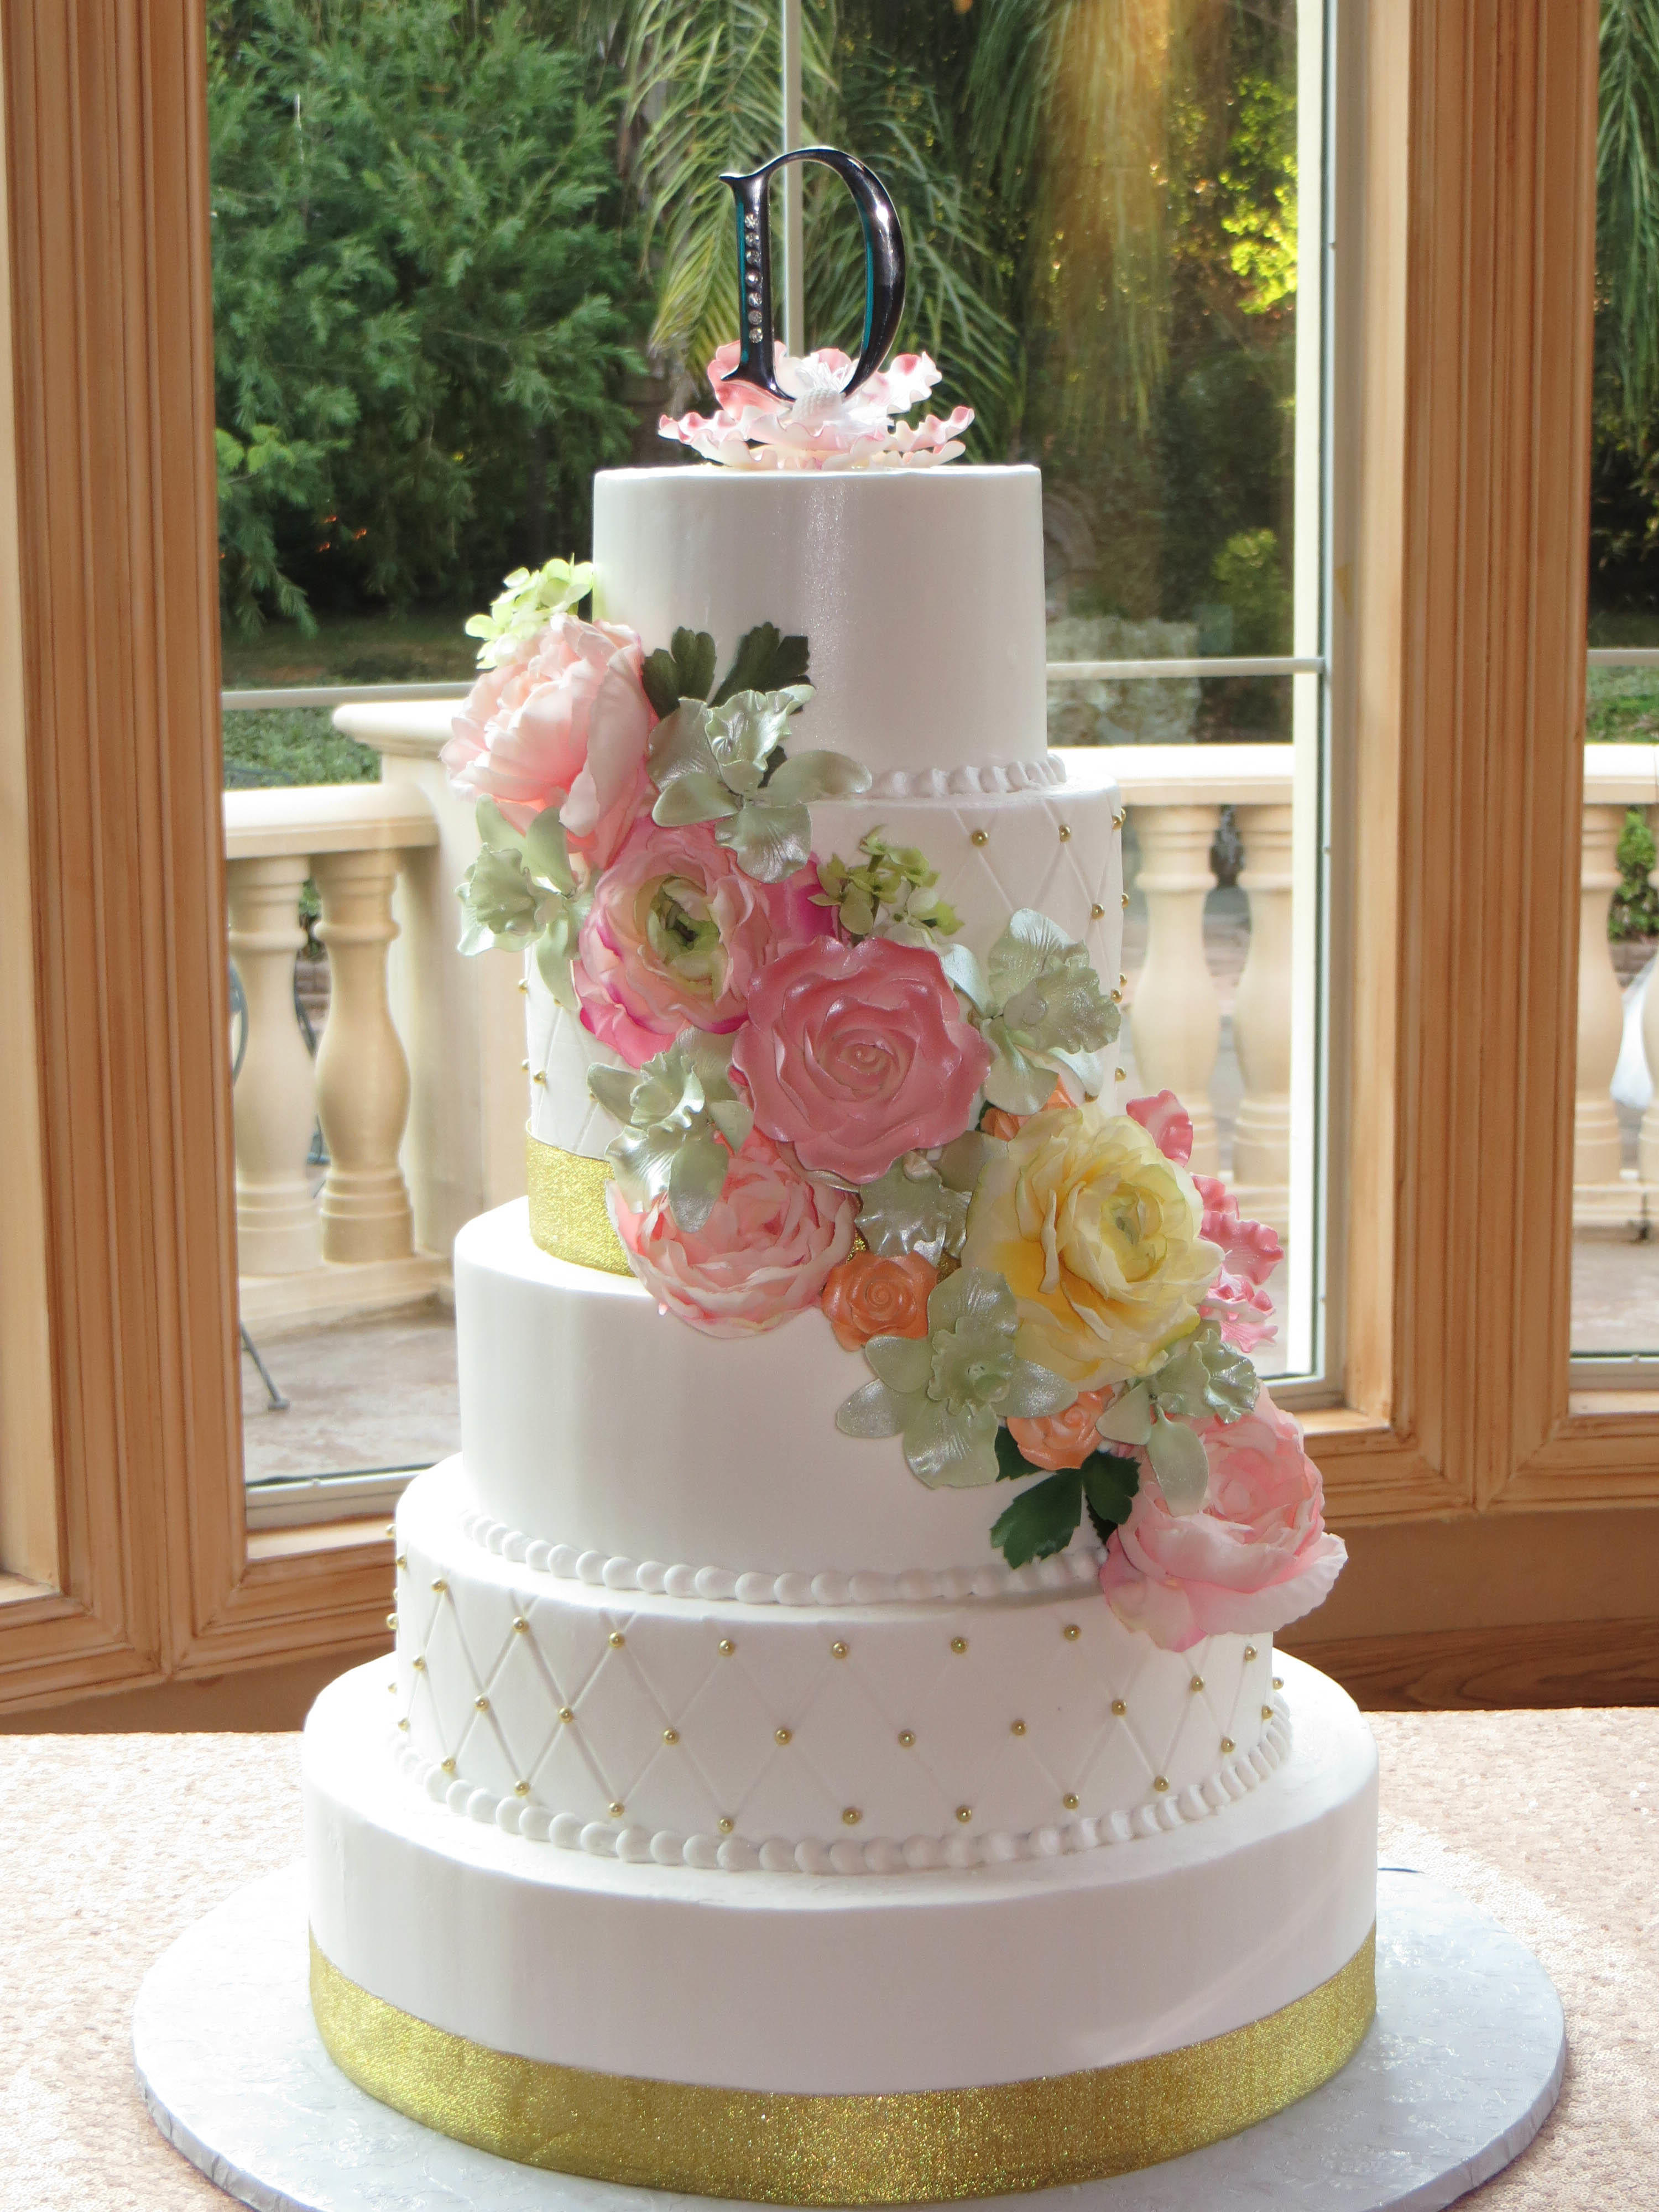 Wedding Cakes by Tammy Allen image 3